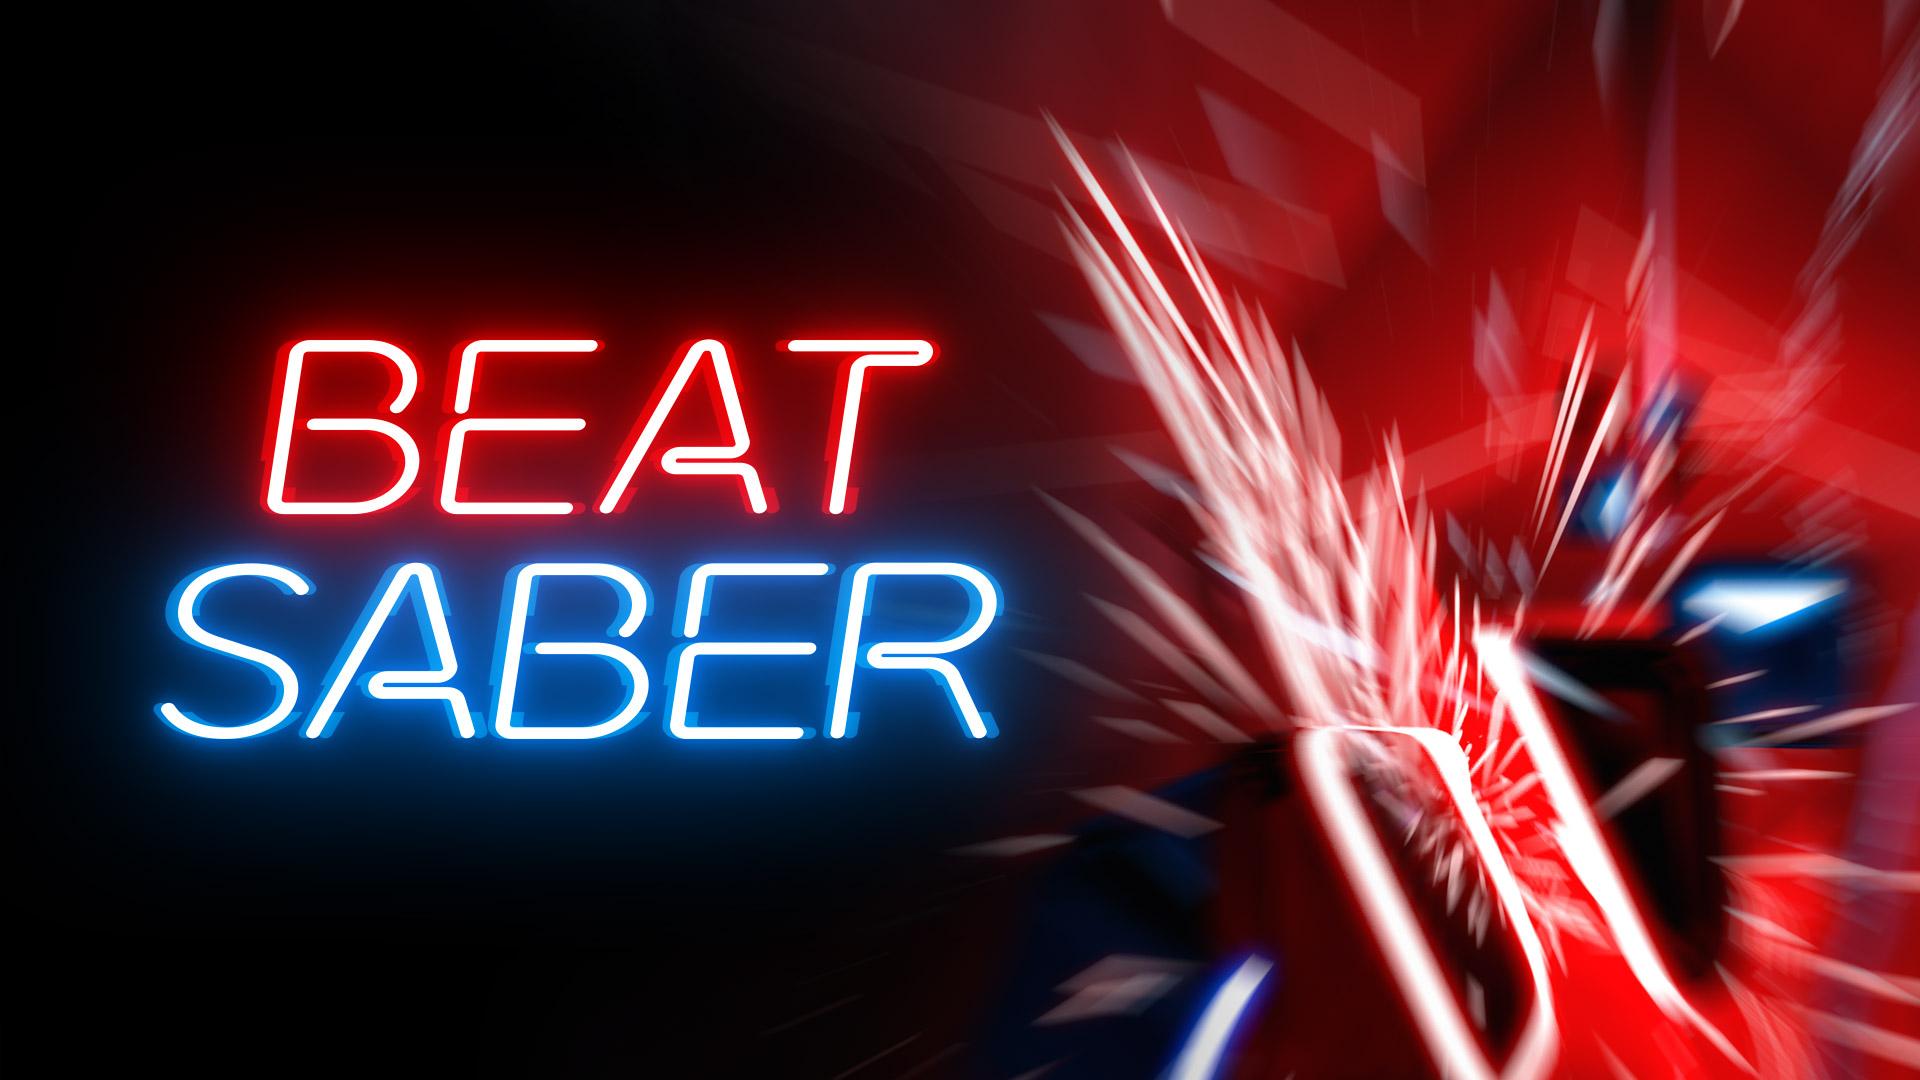 beat saber vr game wallpaper 67664